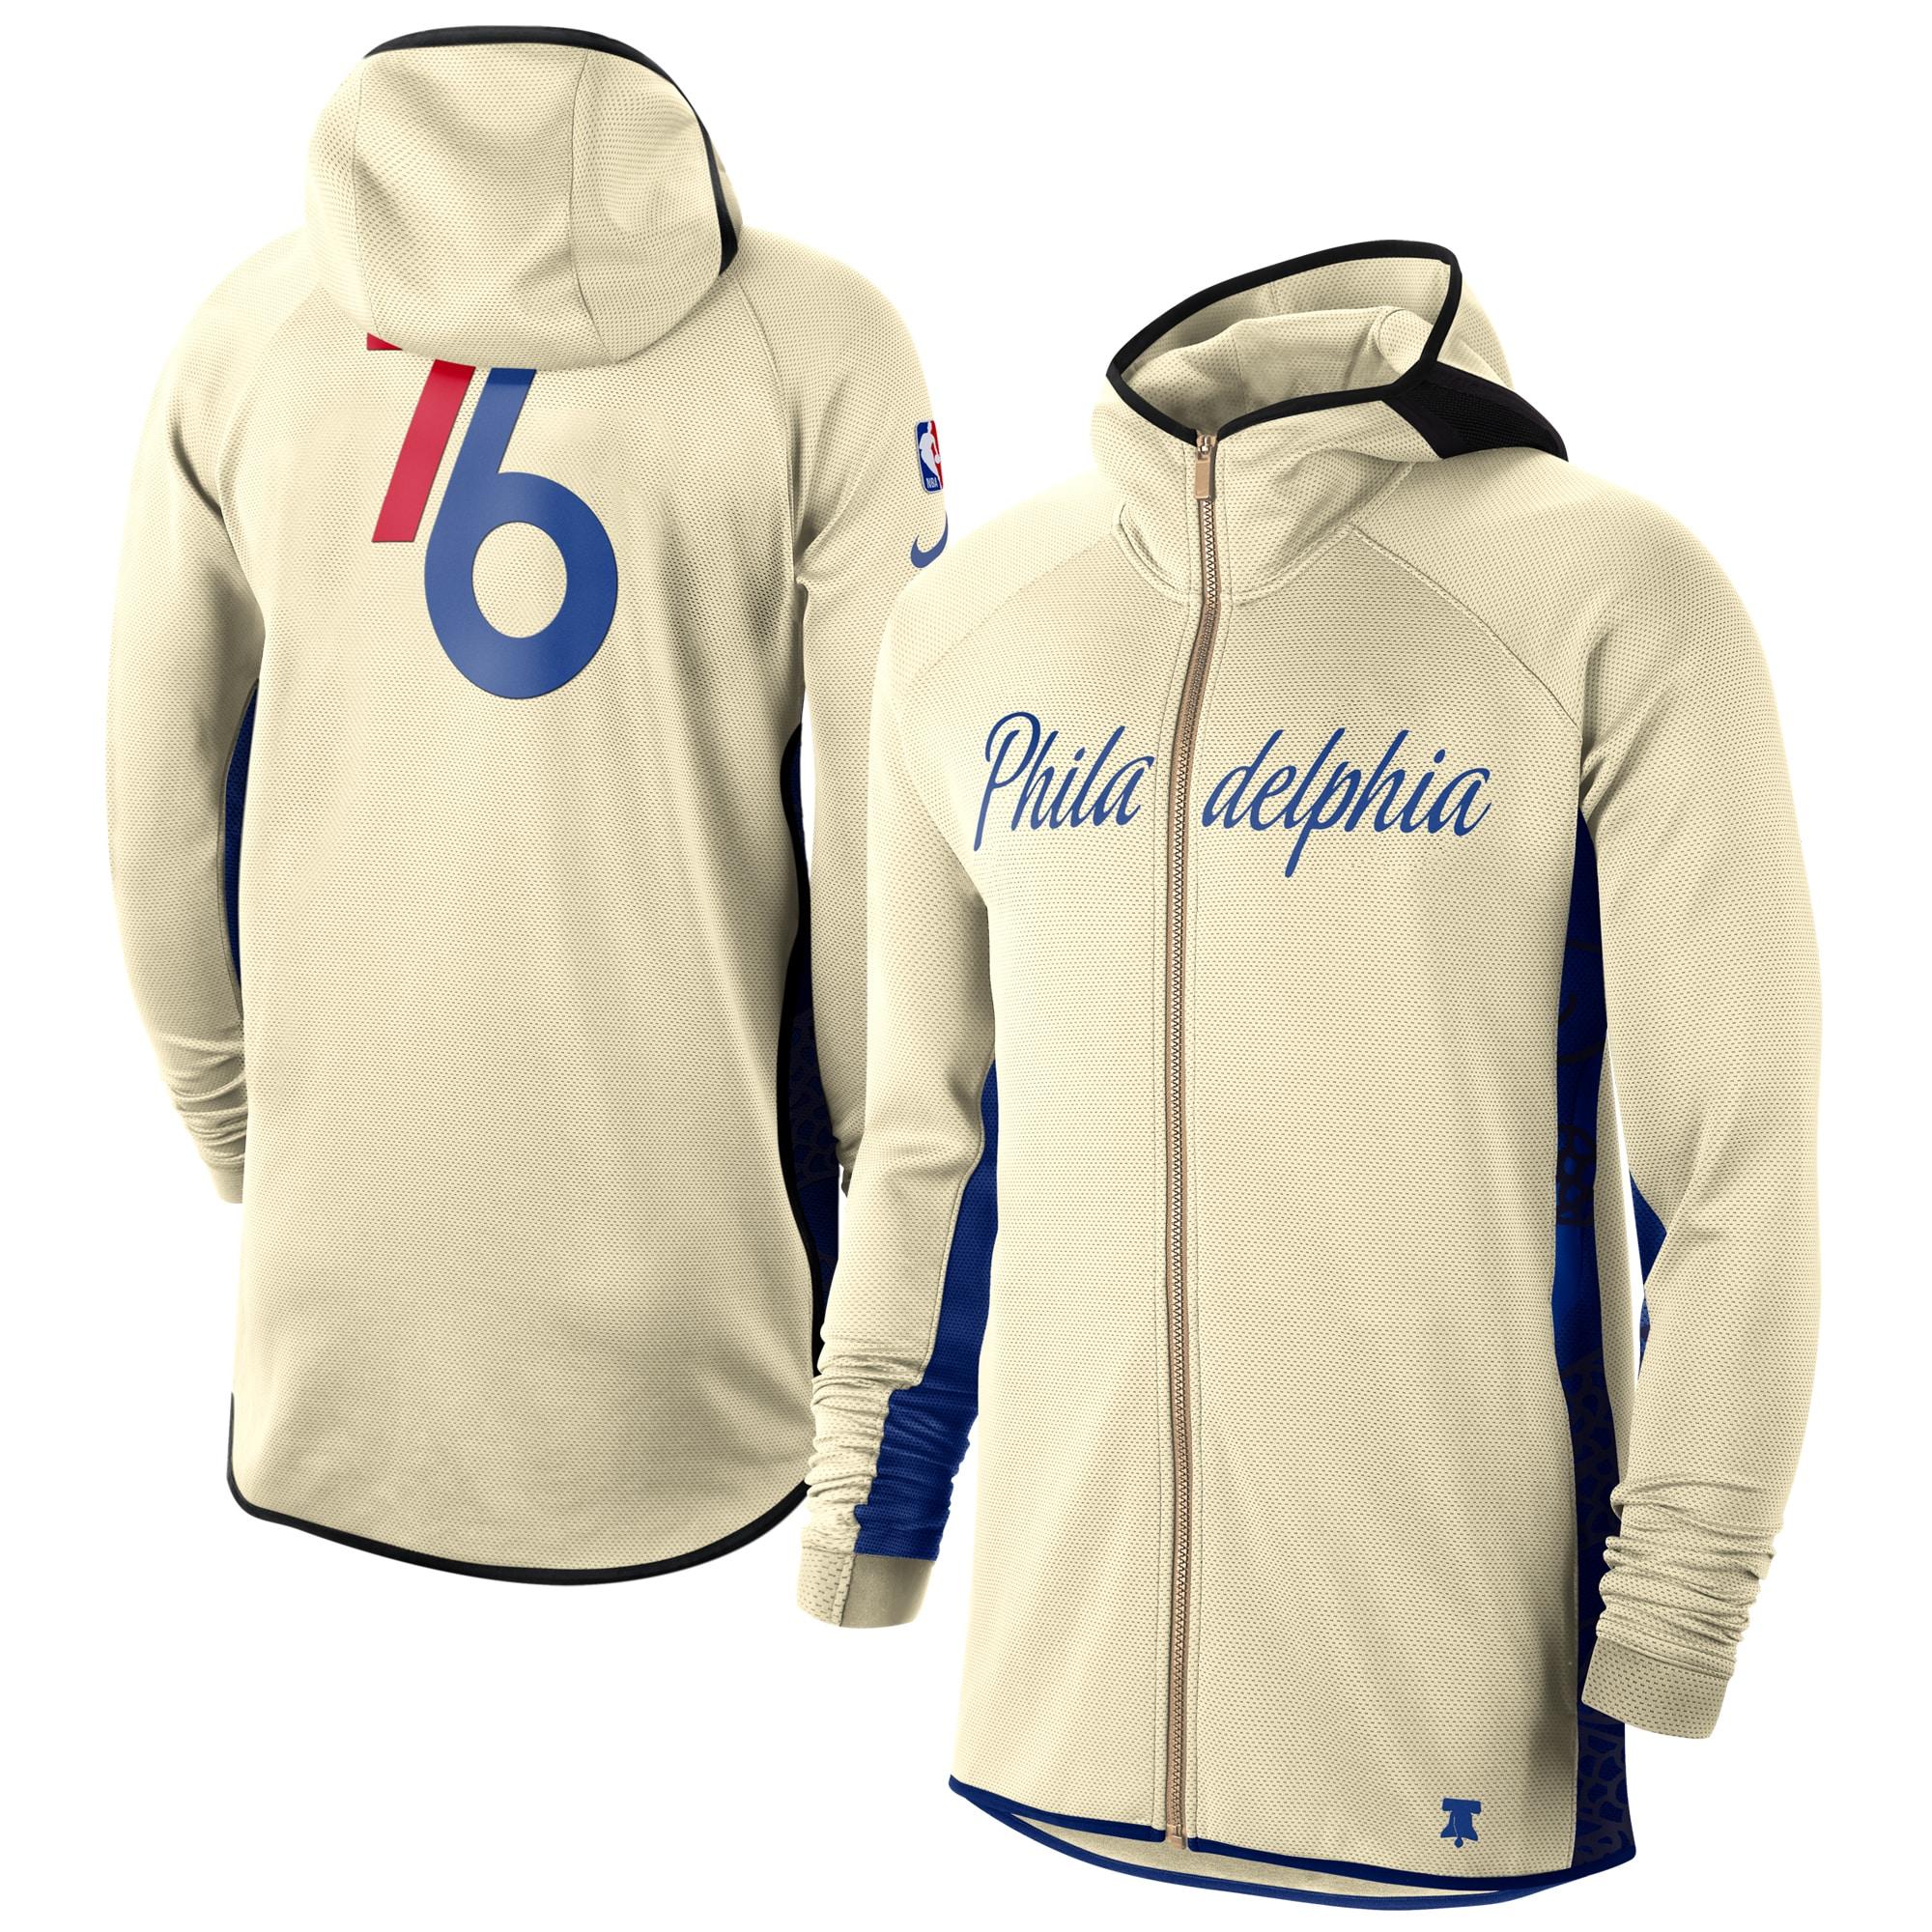 Philadelphia 76ers Nike 2019/20 Earned Edition Showtime Full-Zip Performance Hoodie - Cream/Blue